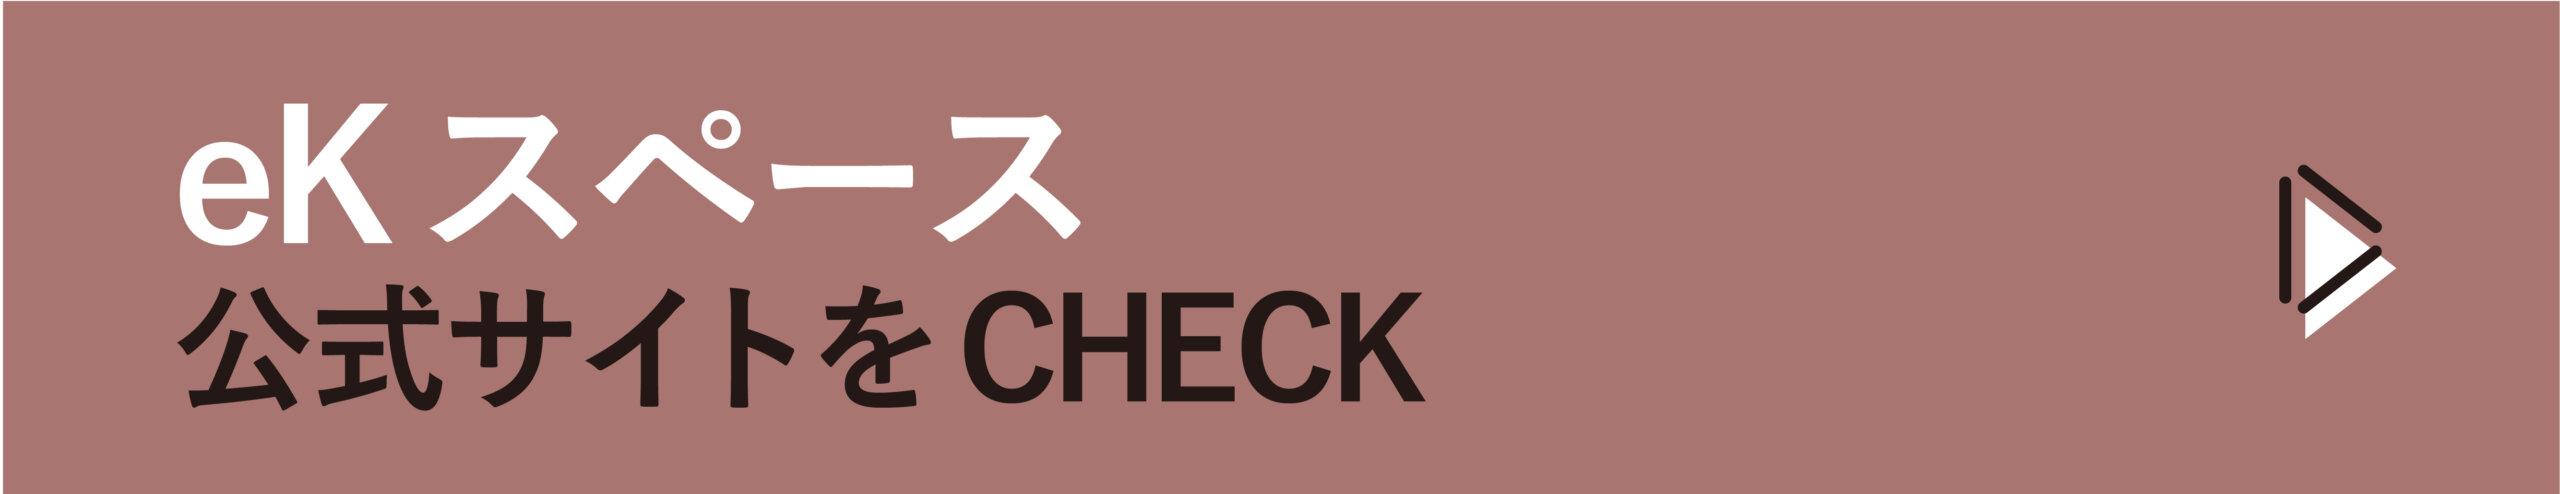 eKスペース公式サイトをCHECK